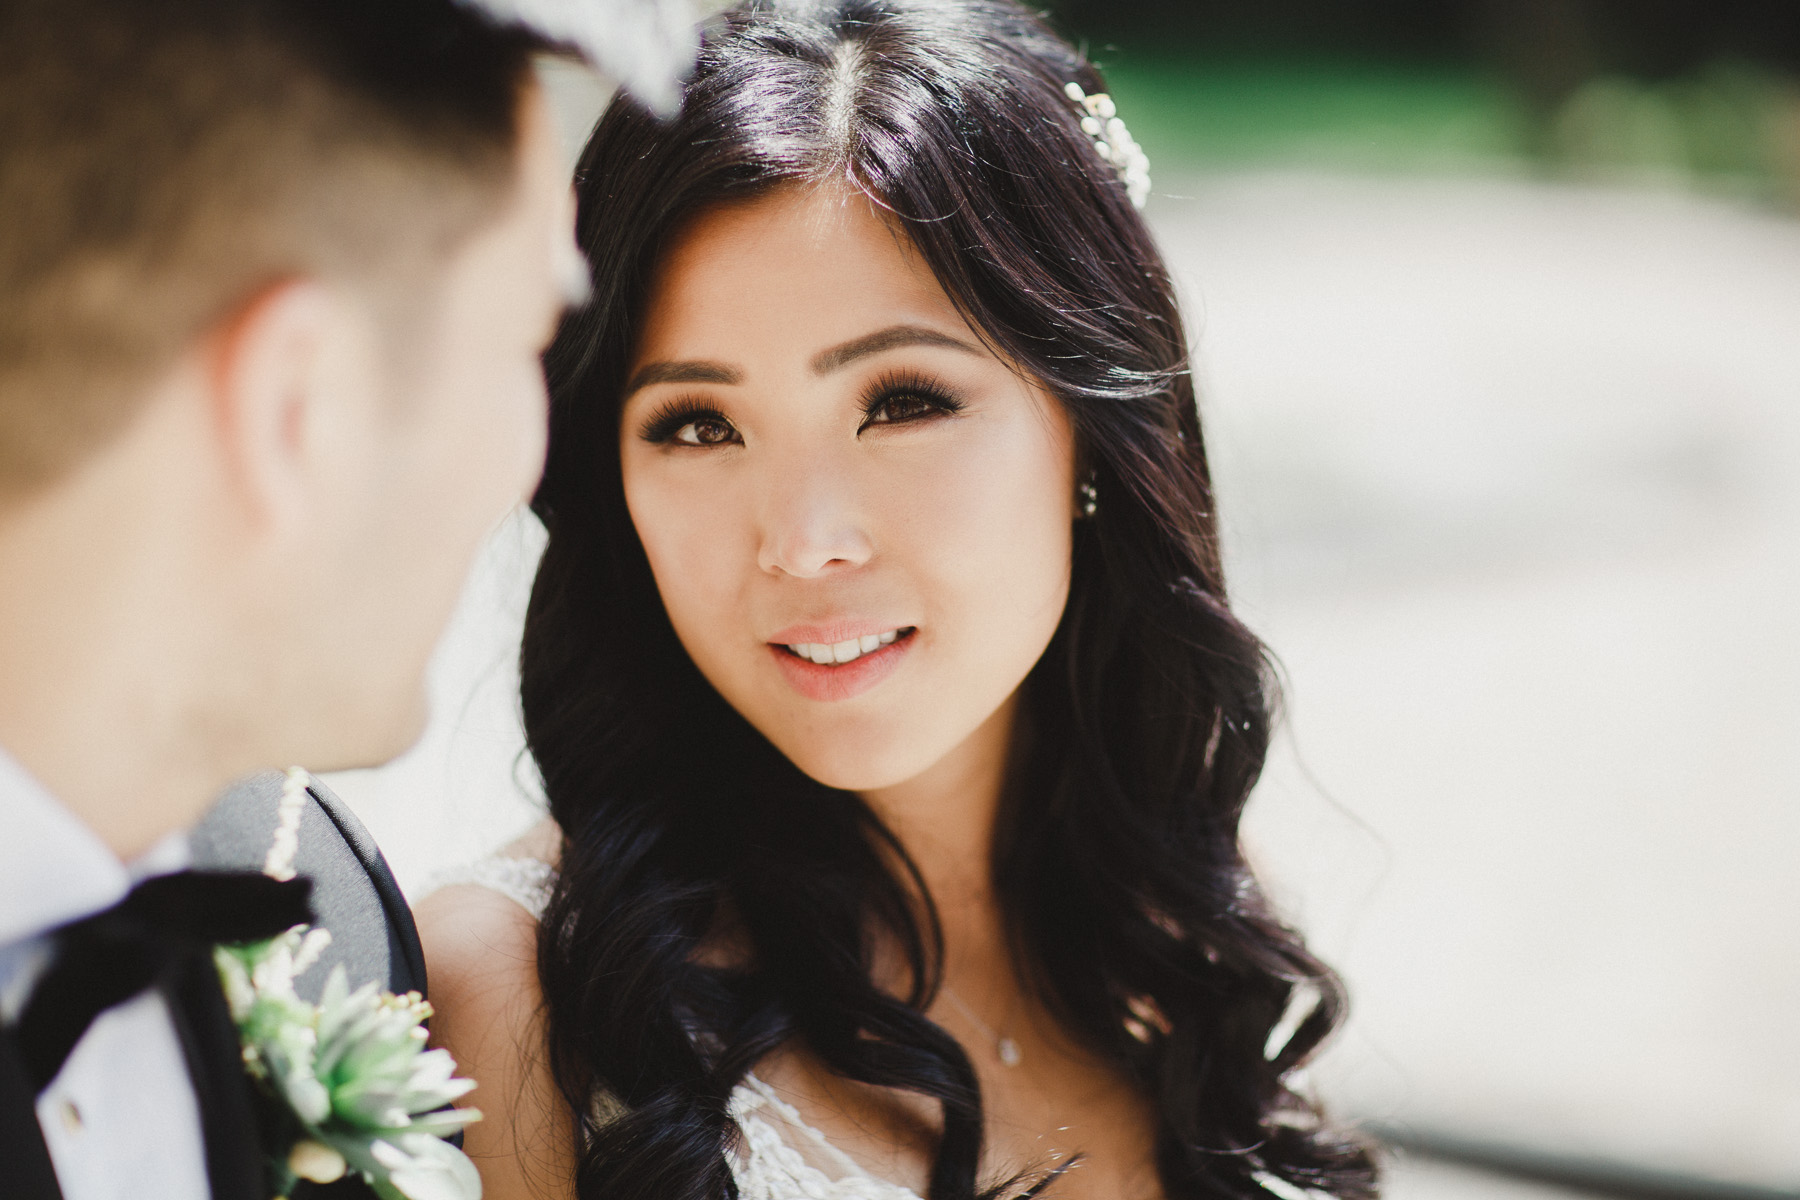 Canoe Restaurant Wedding | Toronto 1 Avangard Photography Toronto Wedding Photographer